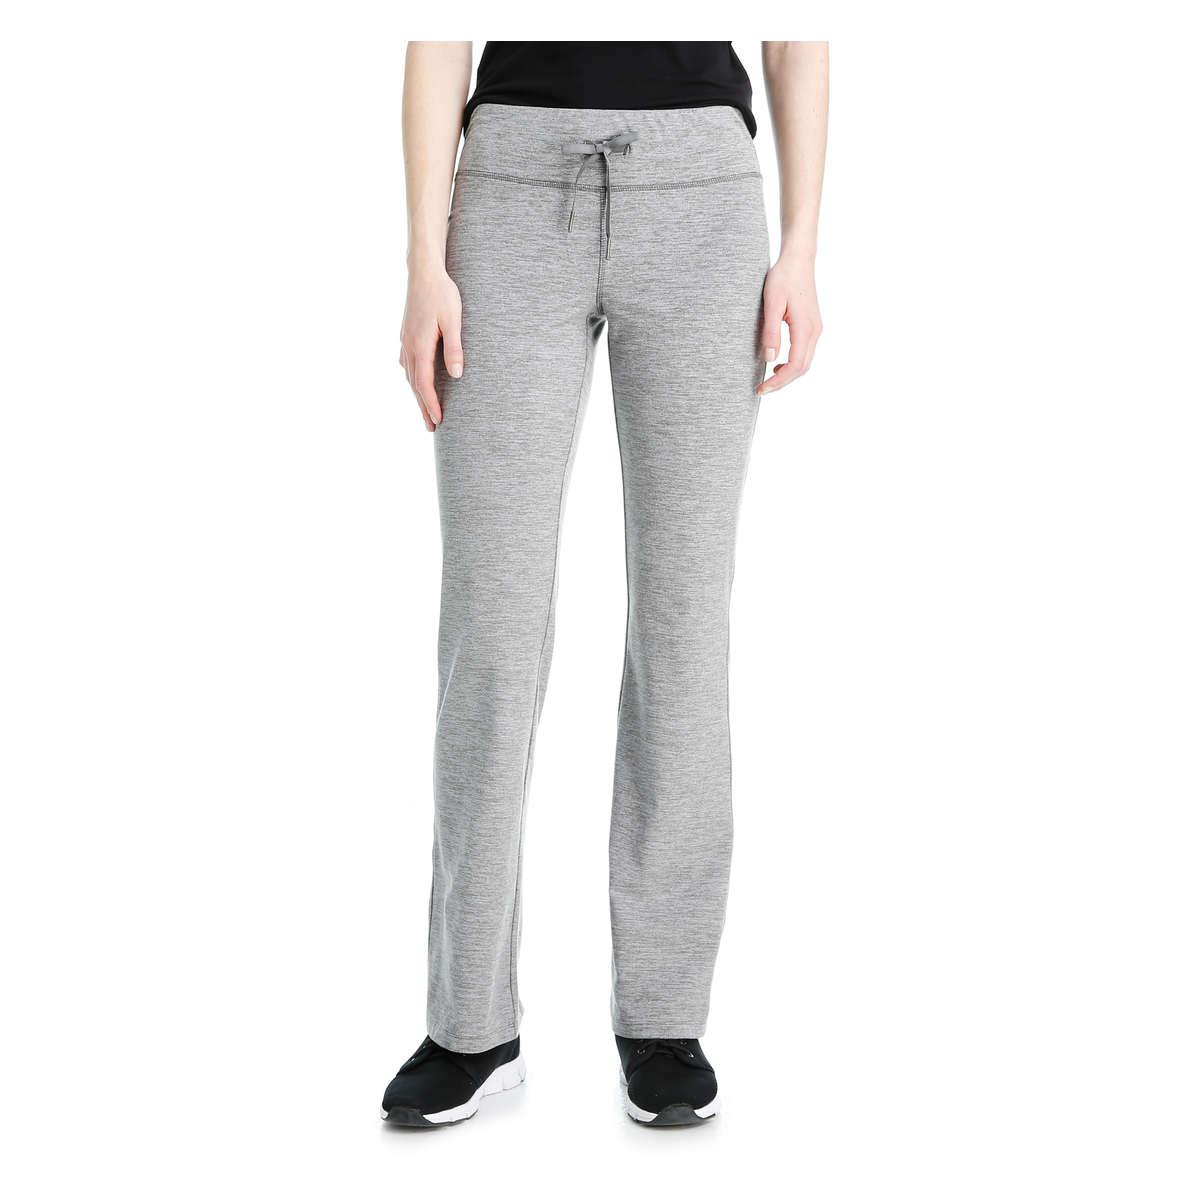 Joe Fresh Active Yoga Pant In Gray